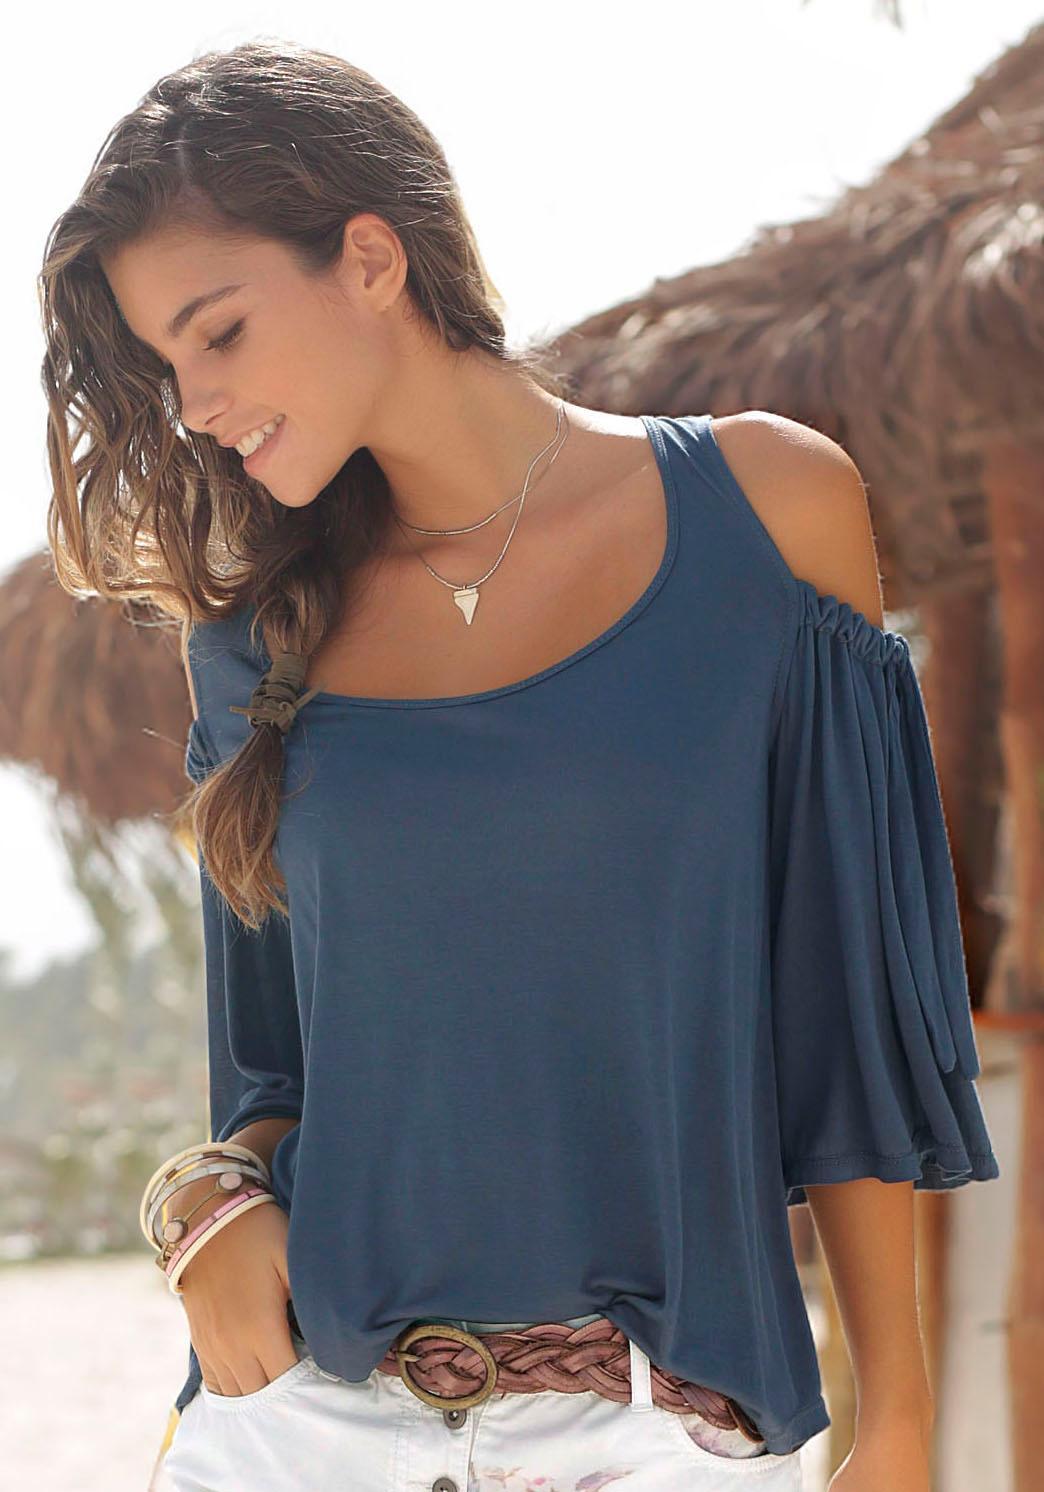 LASCANA Rundhalsshirt   Bekleidung > Shirts > Rundhalsshirts   Lascana